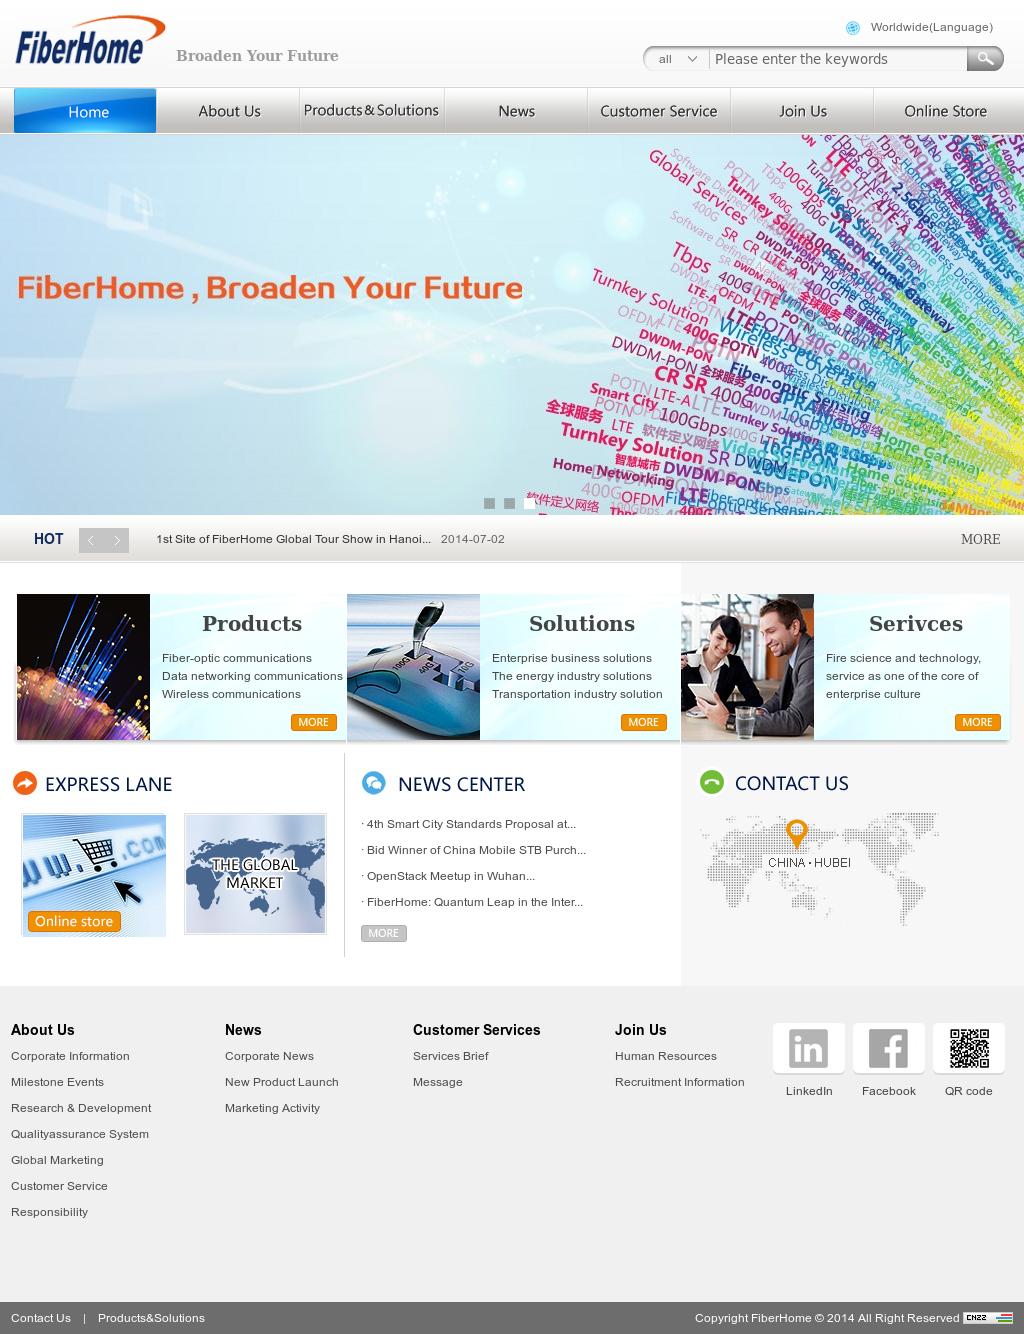 Fiberhome Competitors, Revenue and Employees - Owler Company